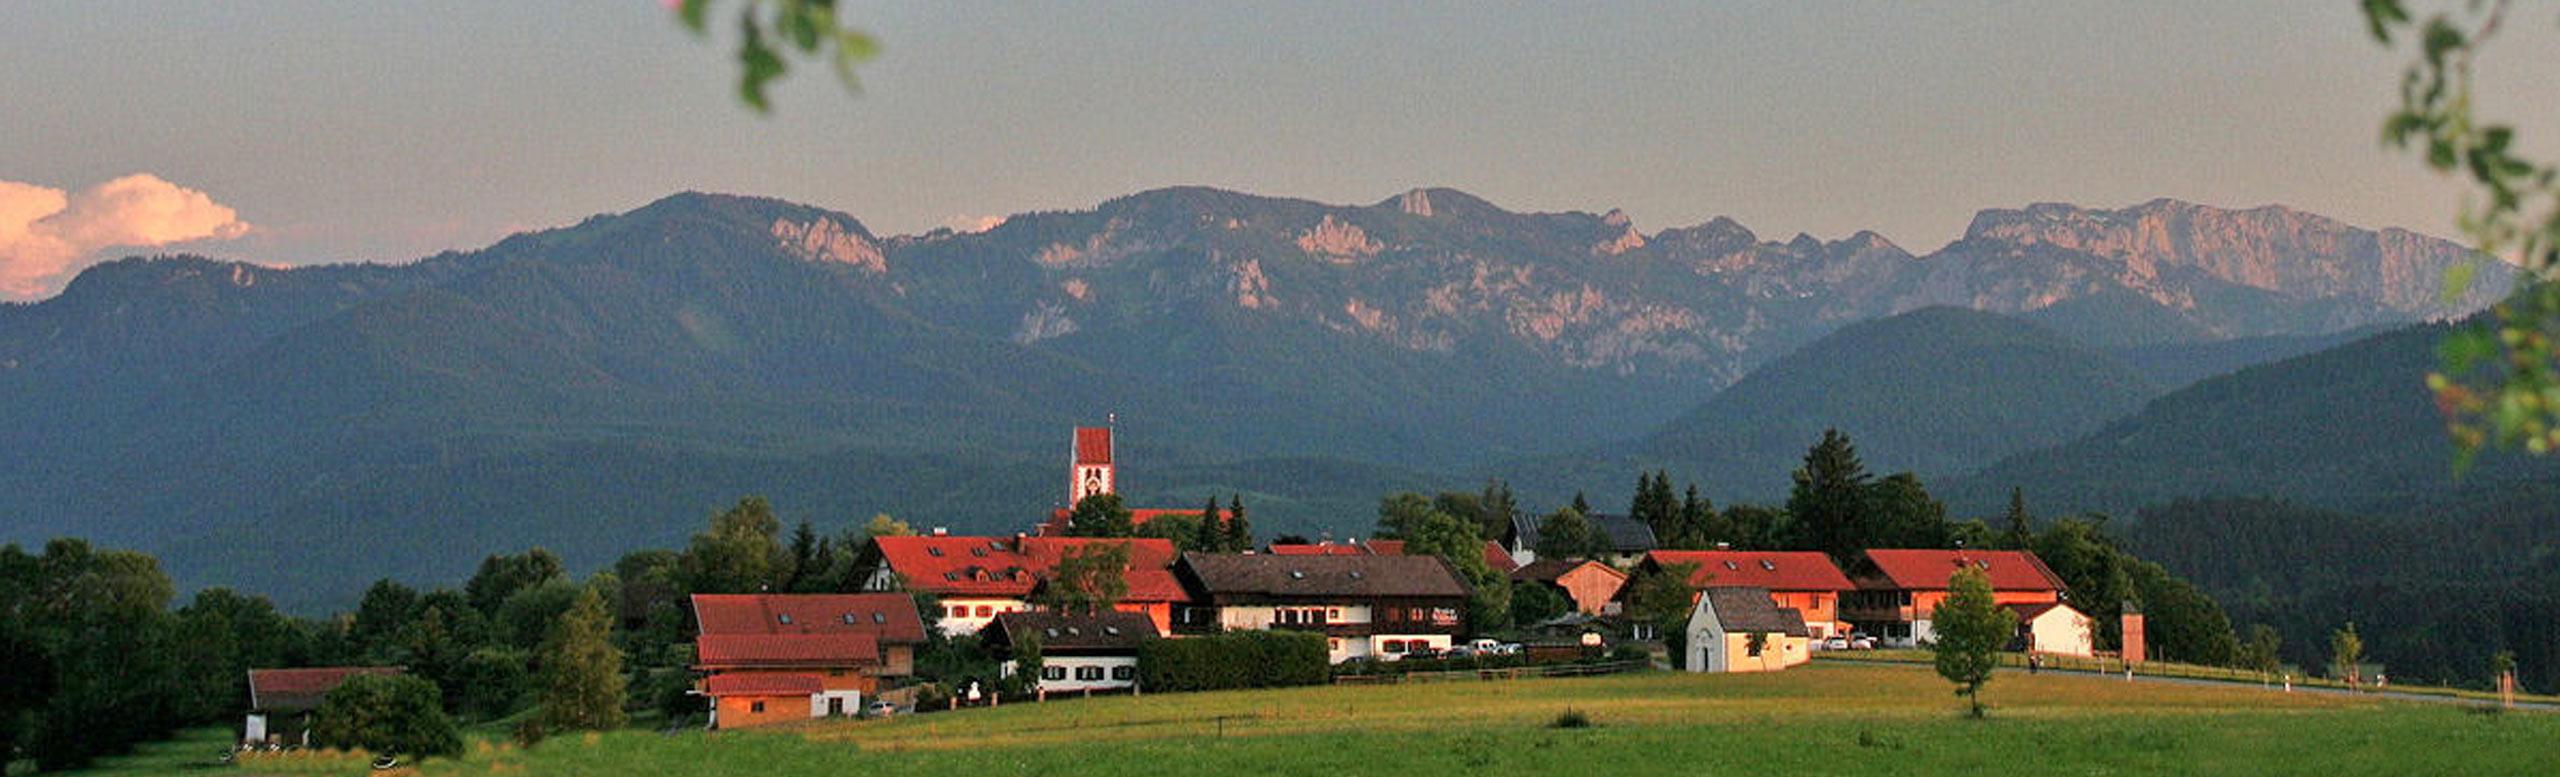 wackersberg-im-juni